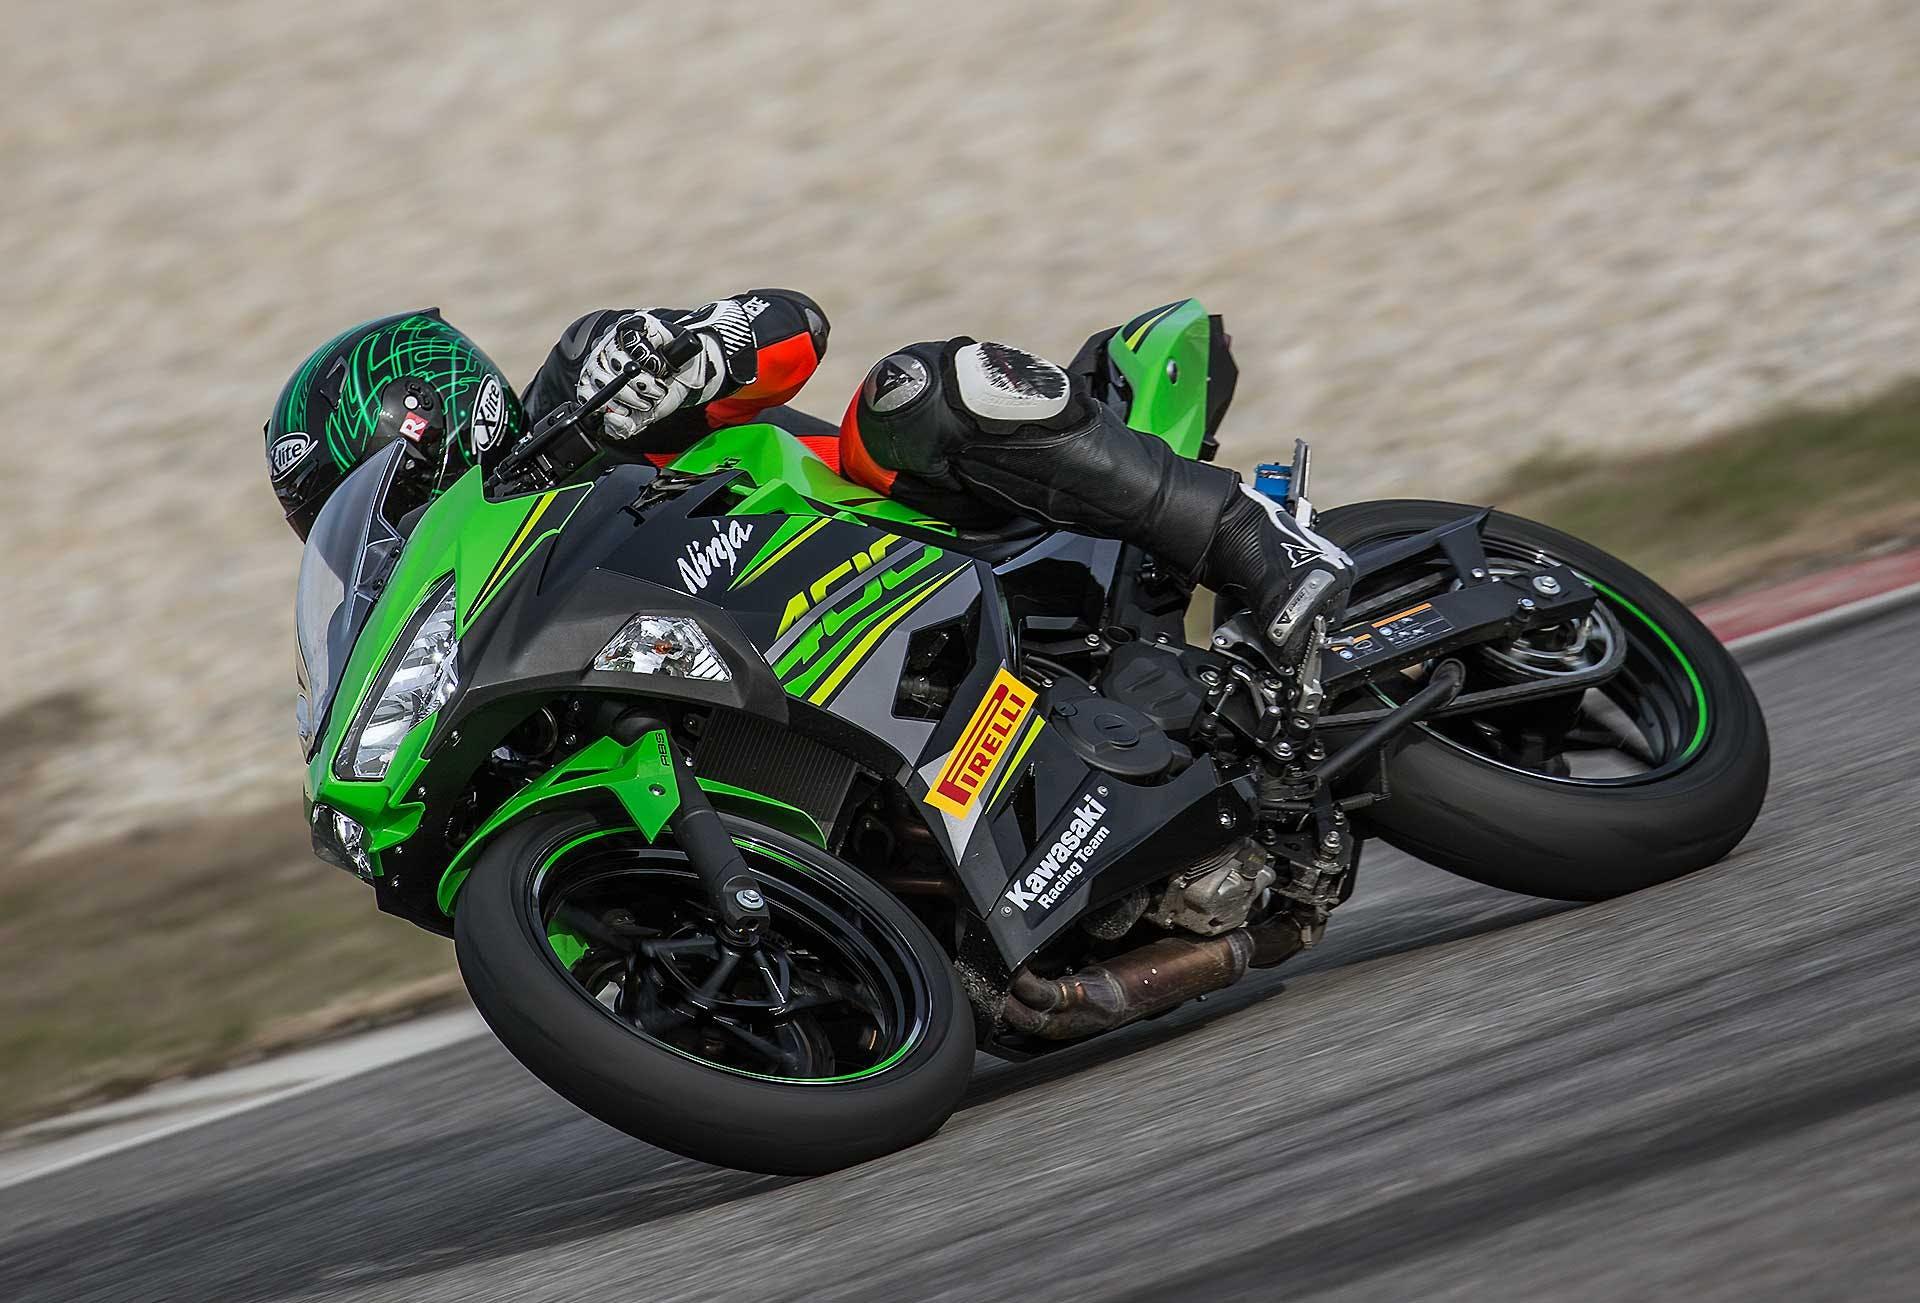 Kawasaki Ninja 400 verde movimento pista laterale